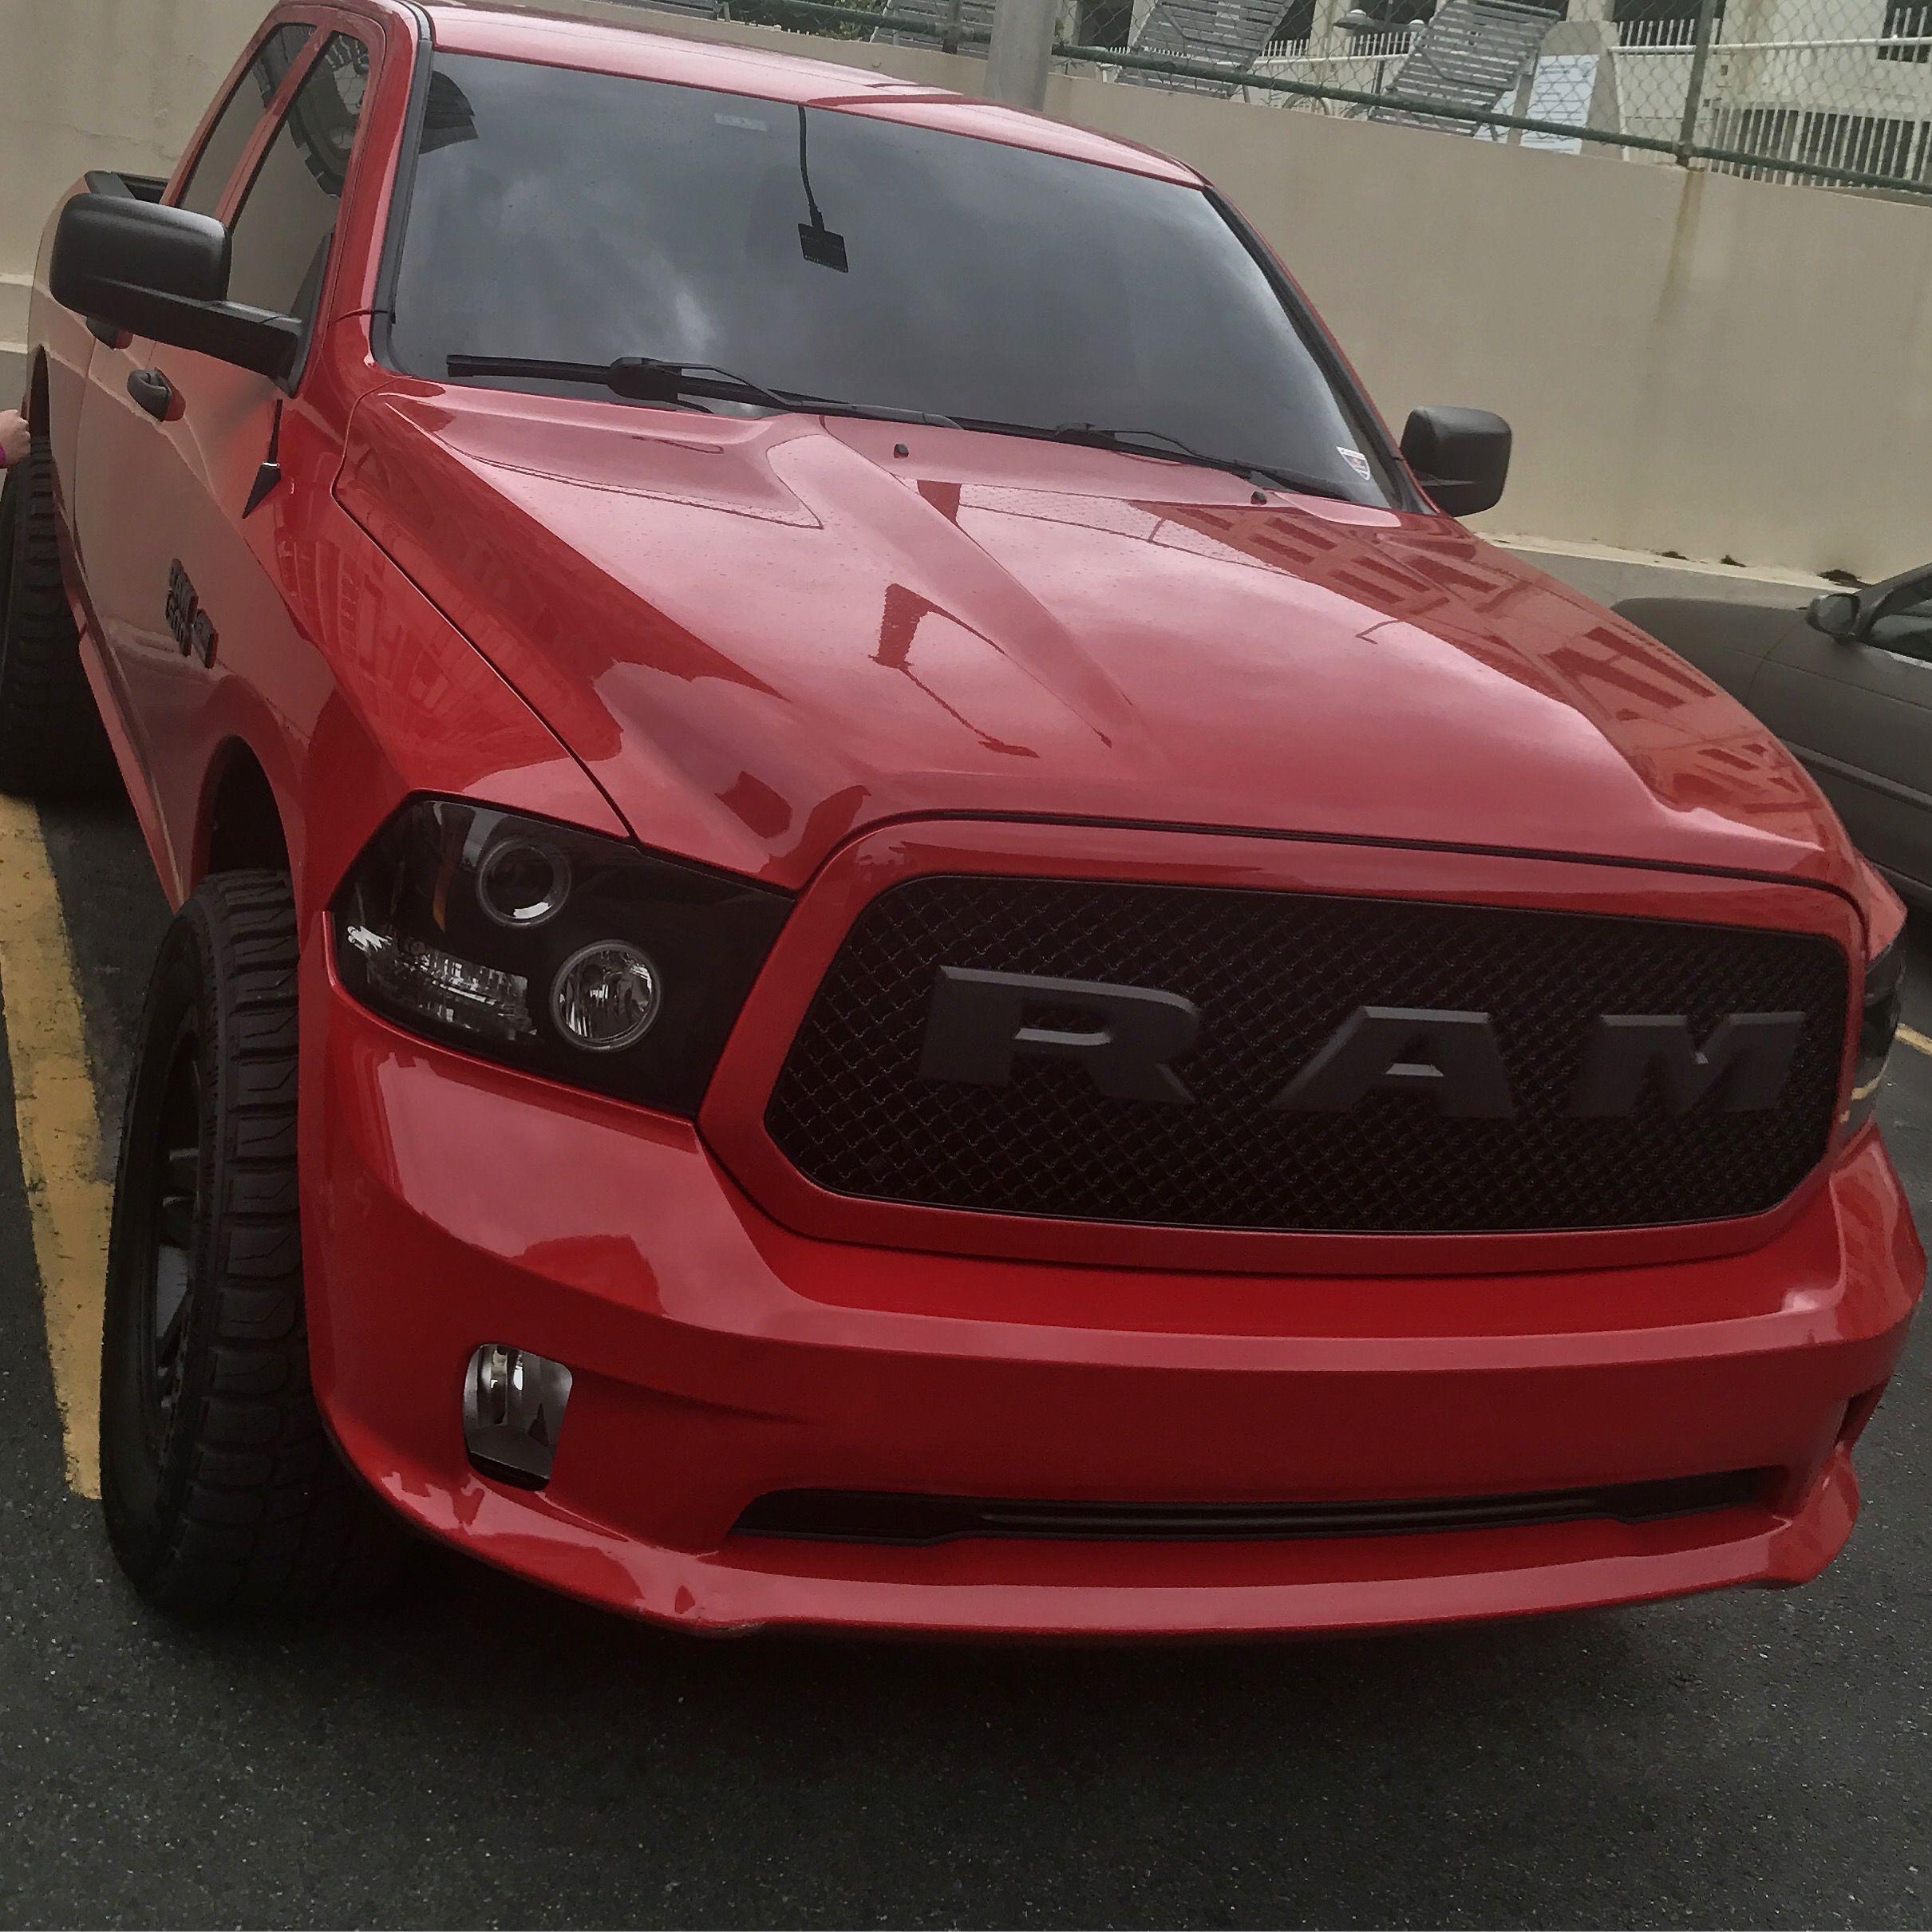 1500 Dodge Ram Accessories: Dodge Ram 1500 #Dodge #ram #ram1500